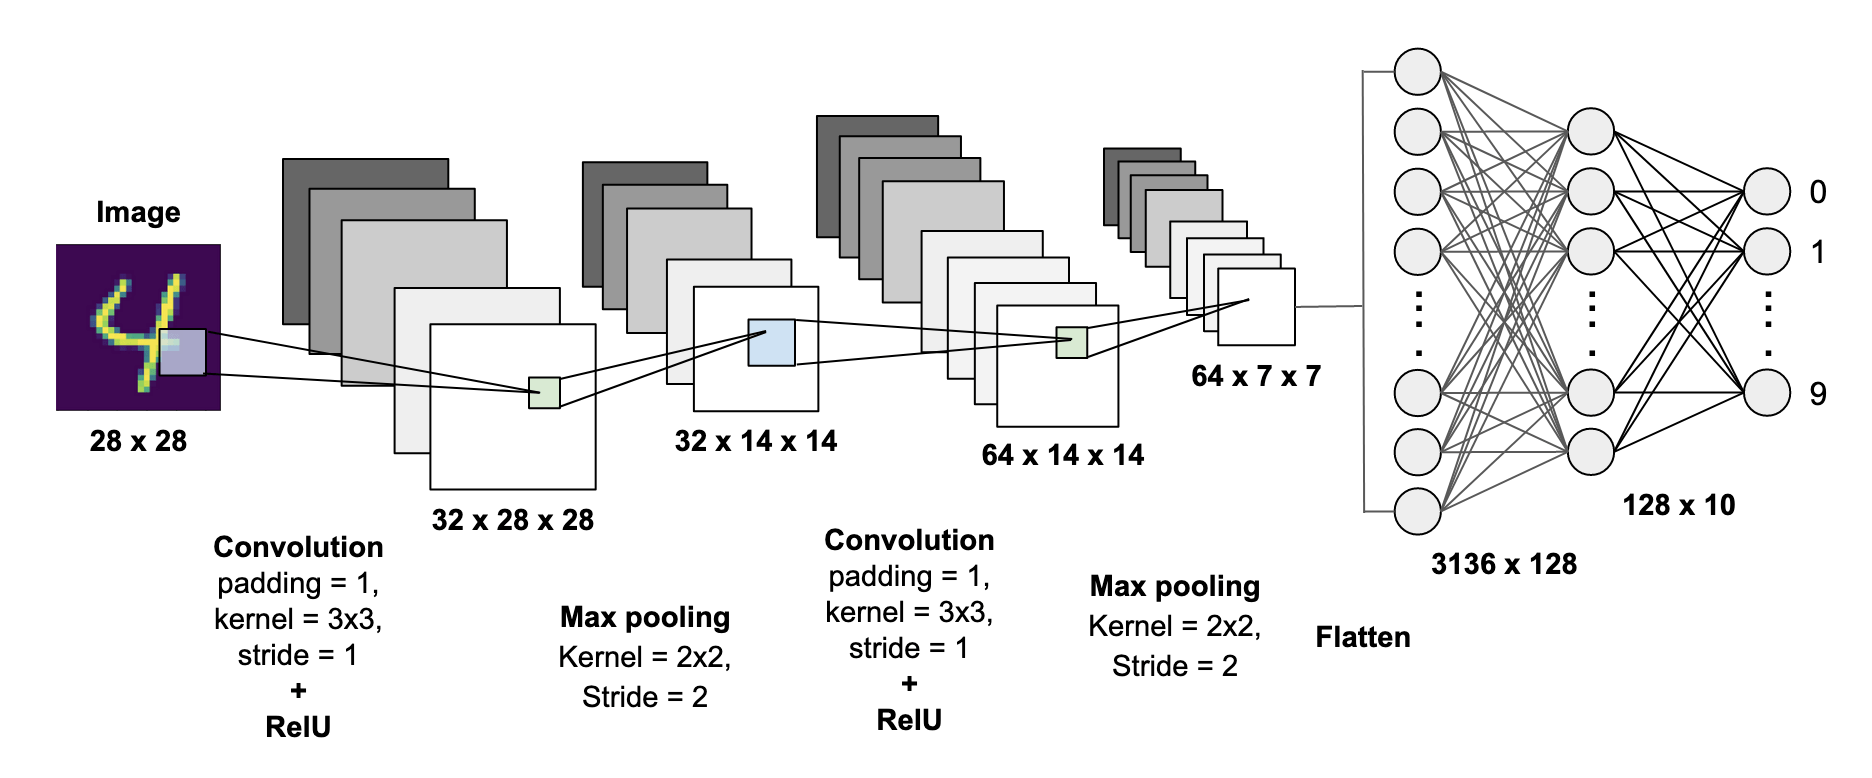 Mnist Handwritten Digits Classification Using A